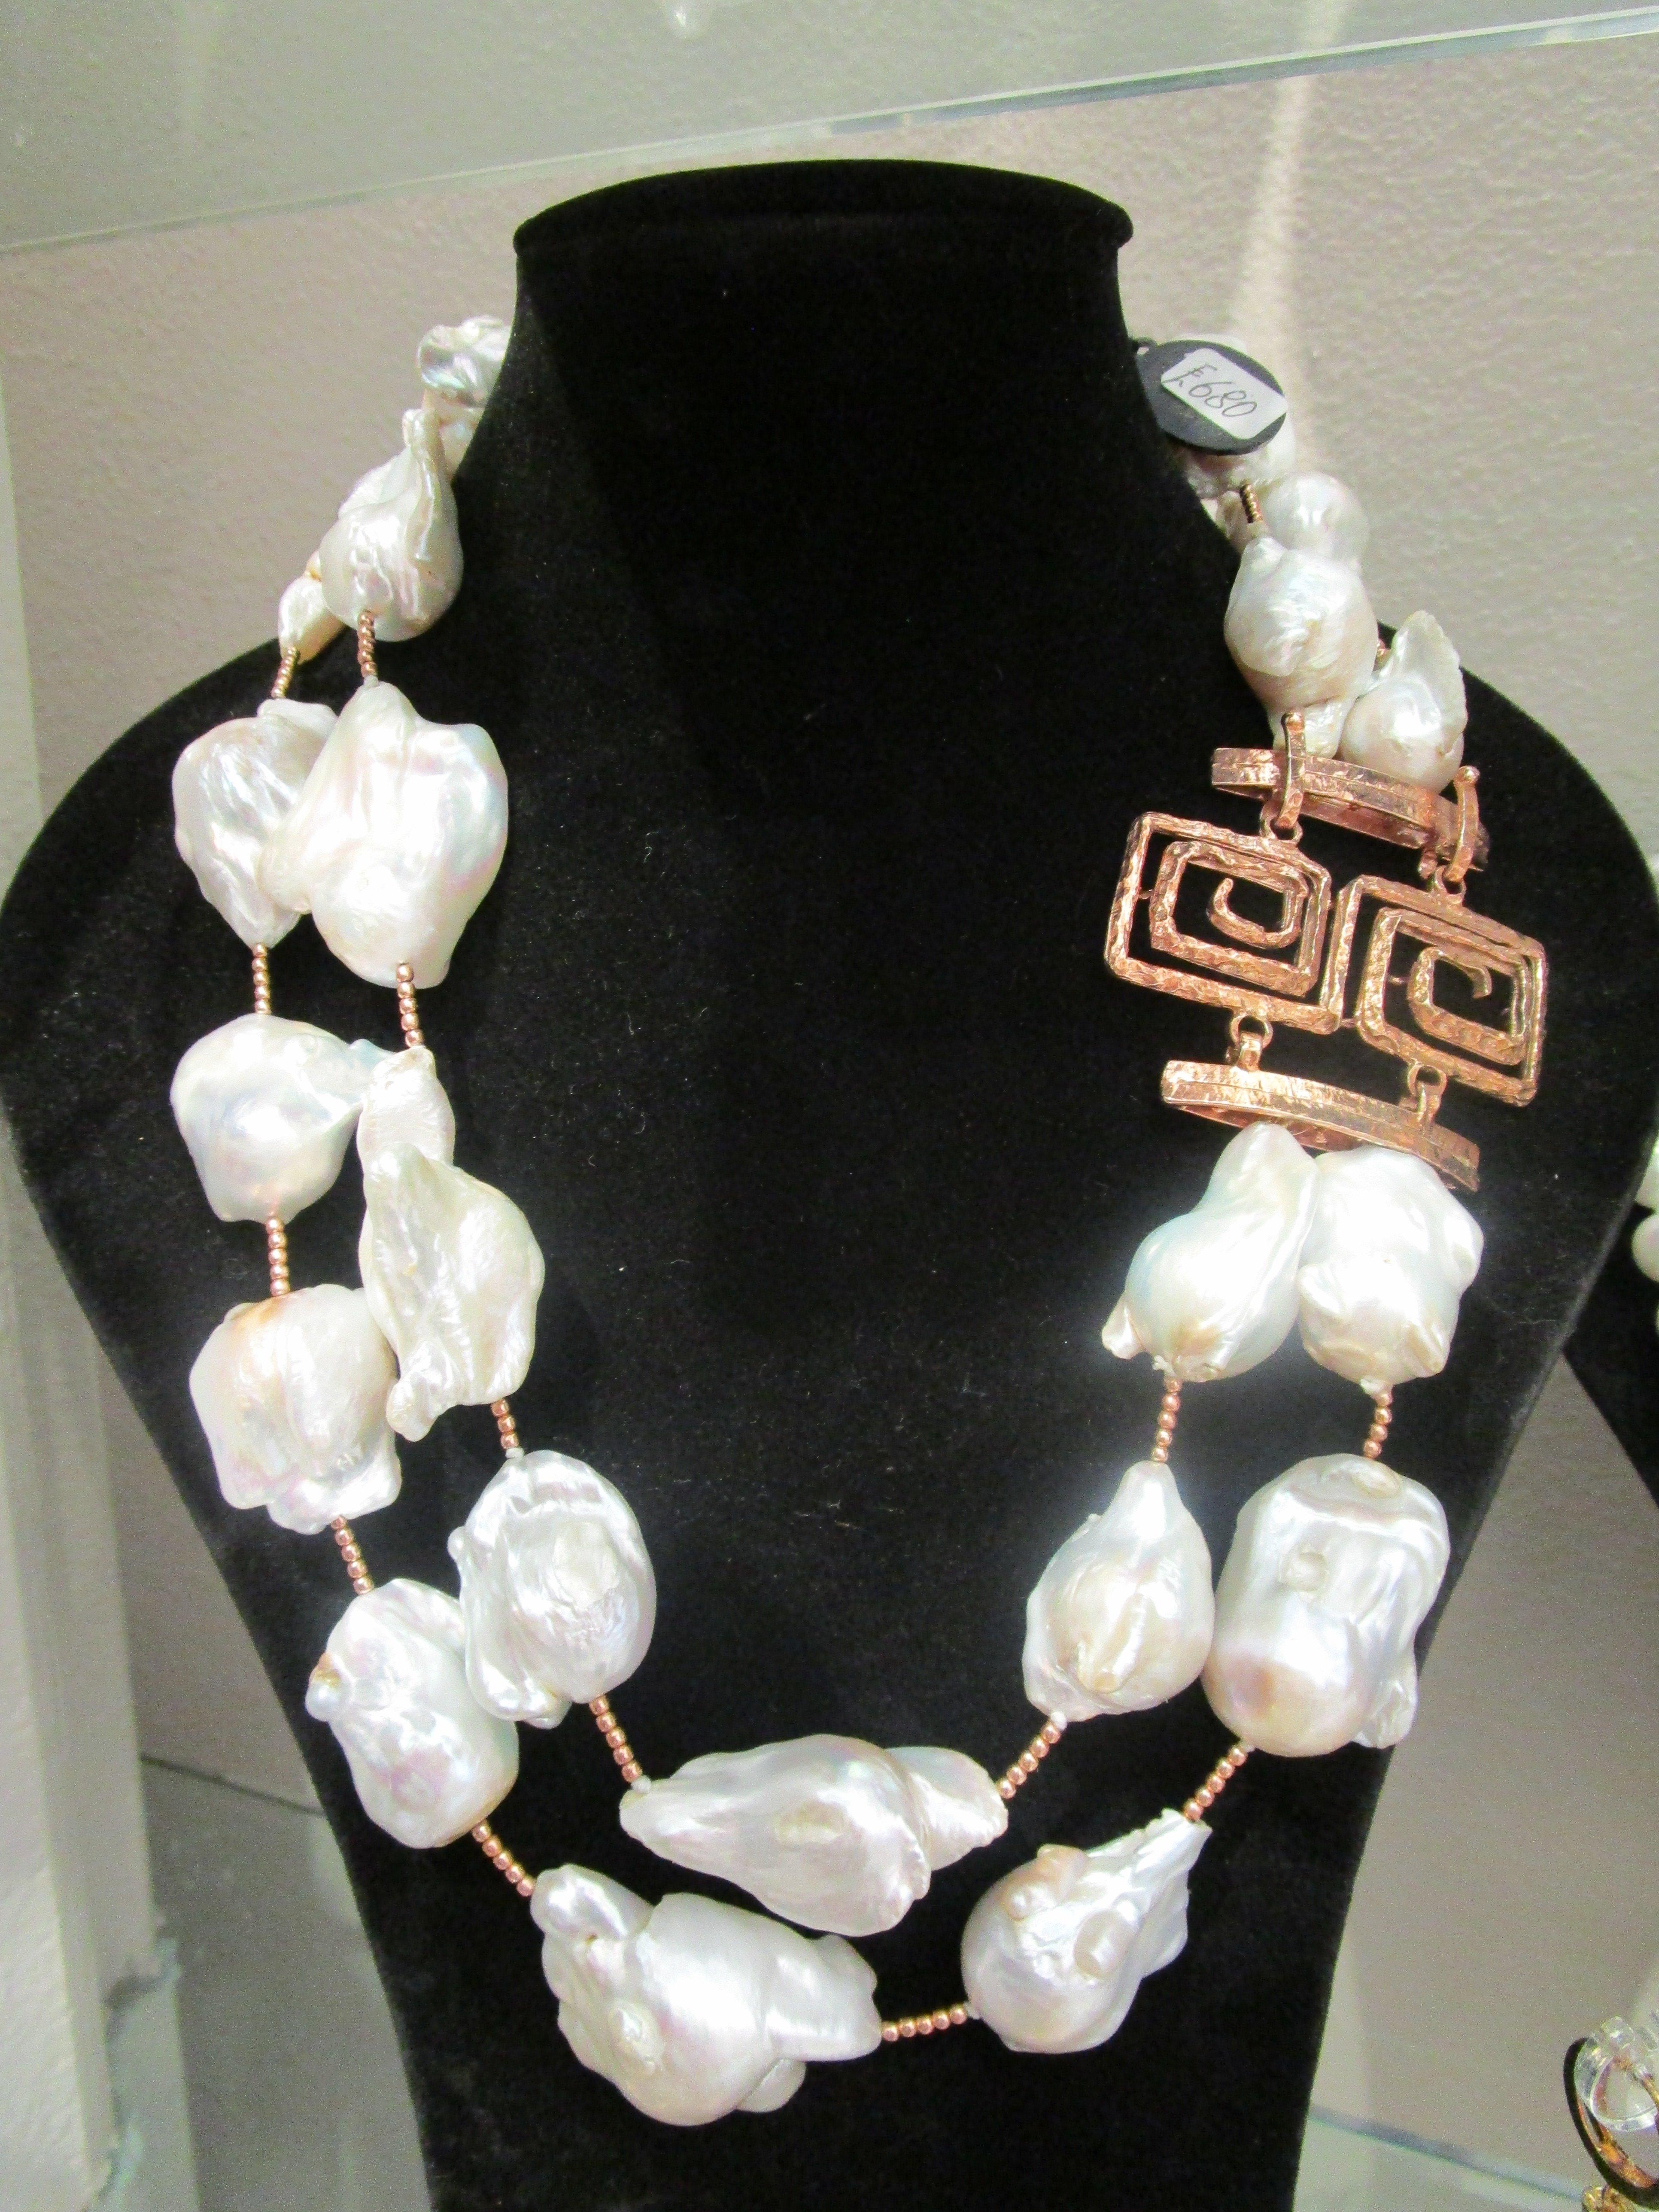 collana bianca su busto nero